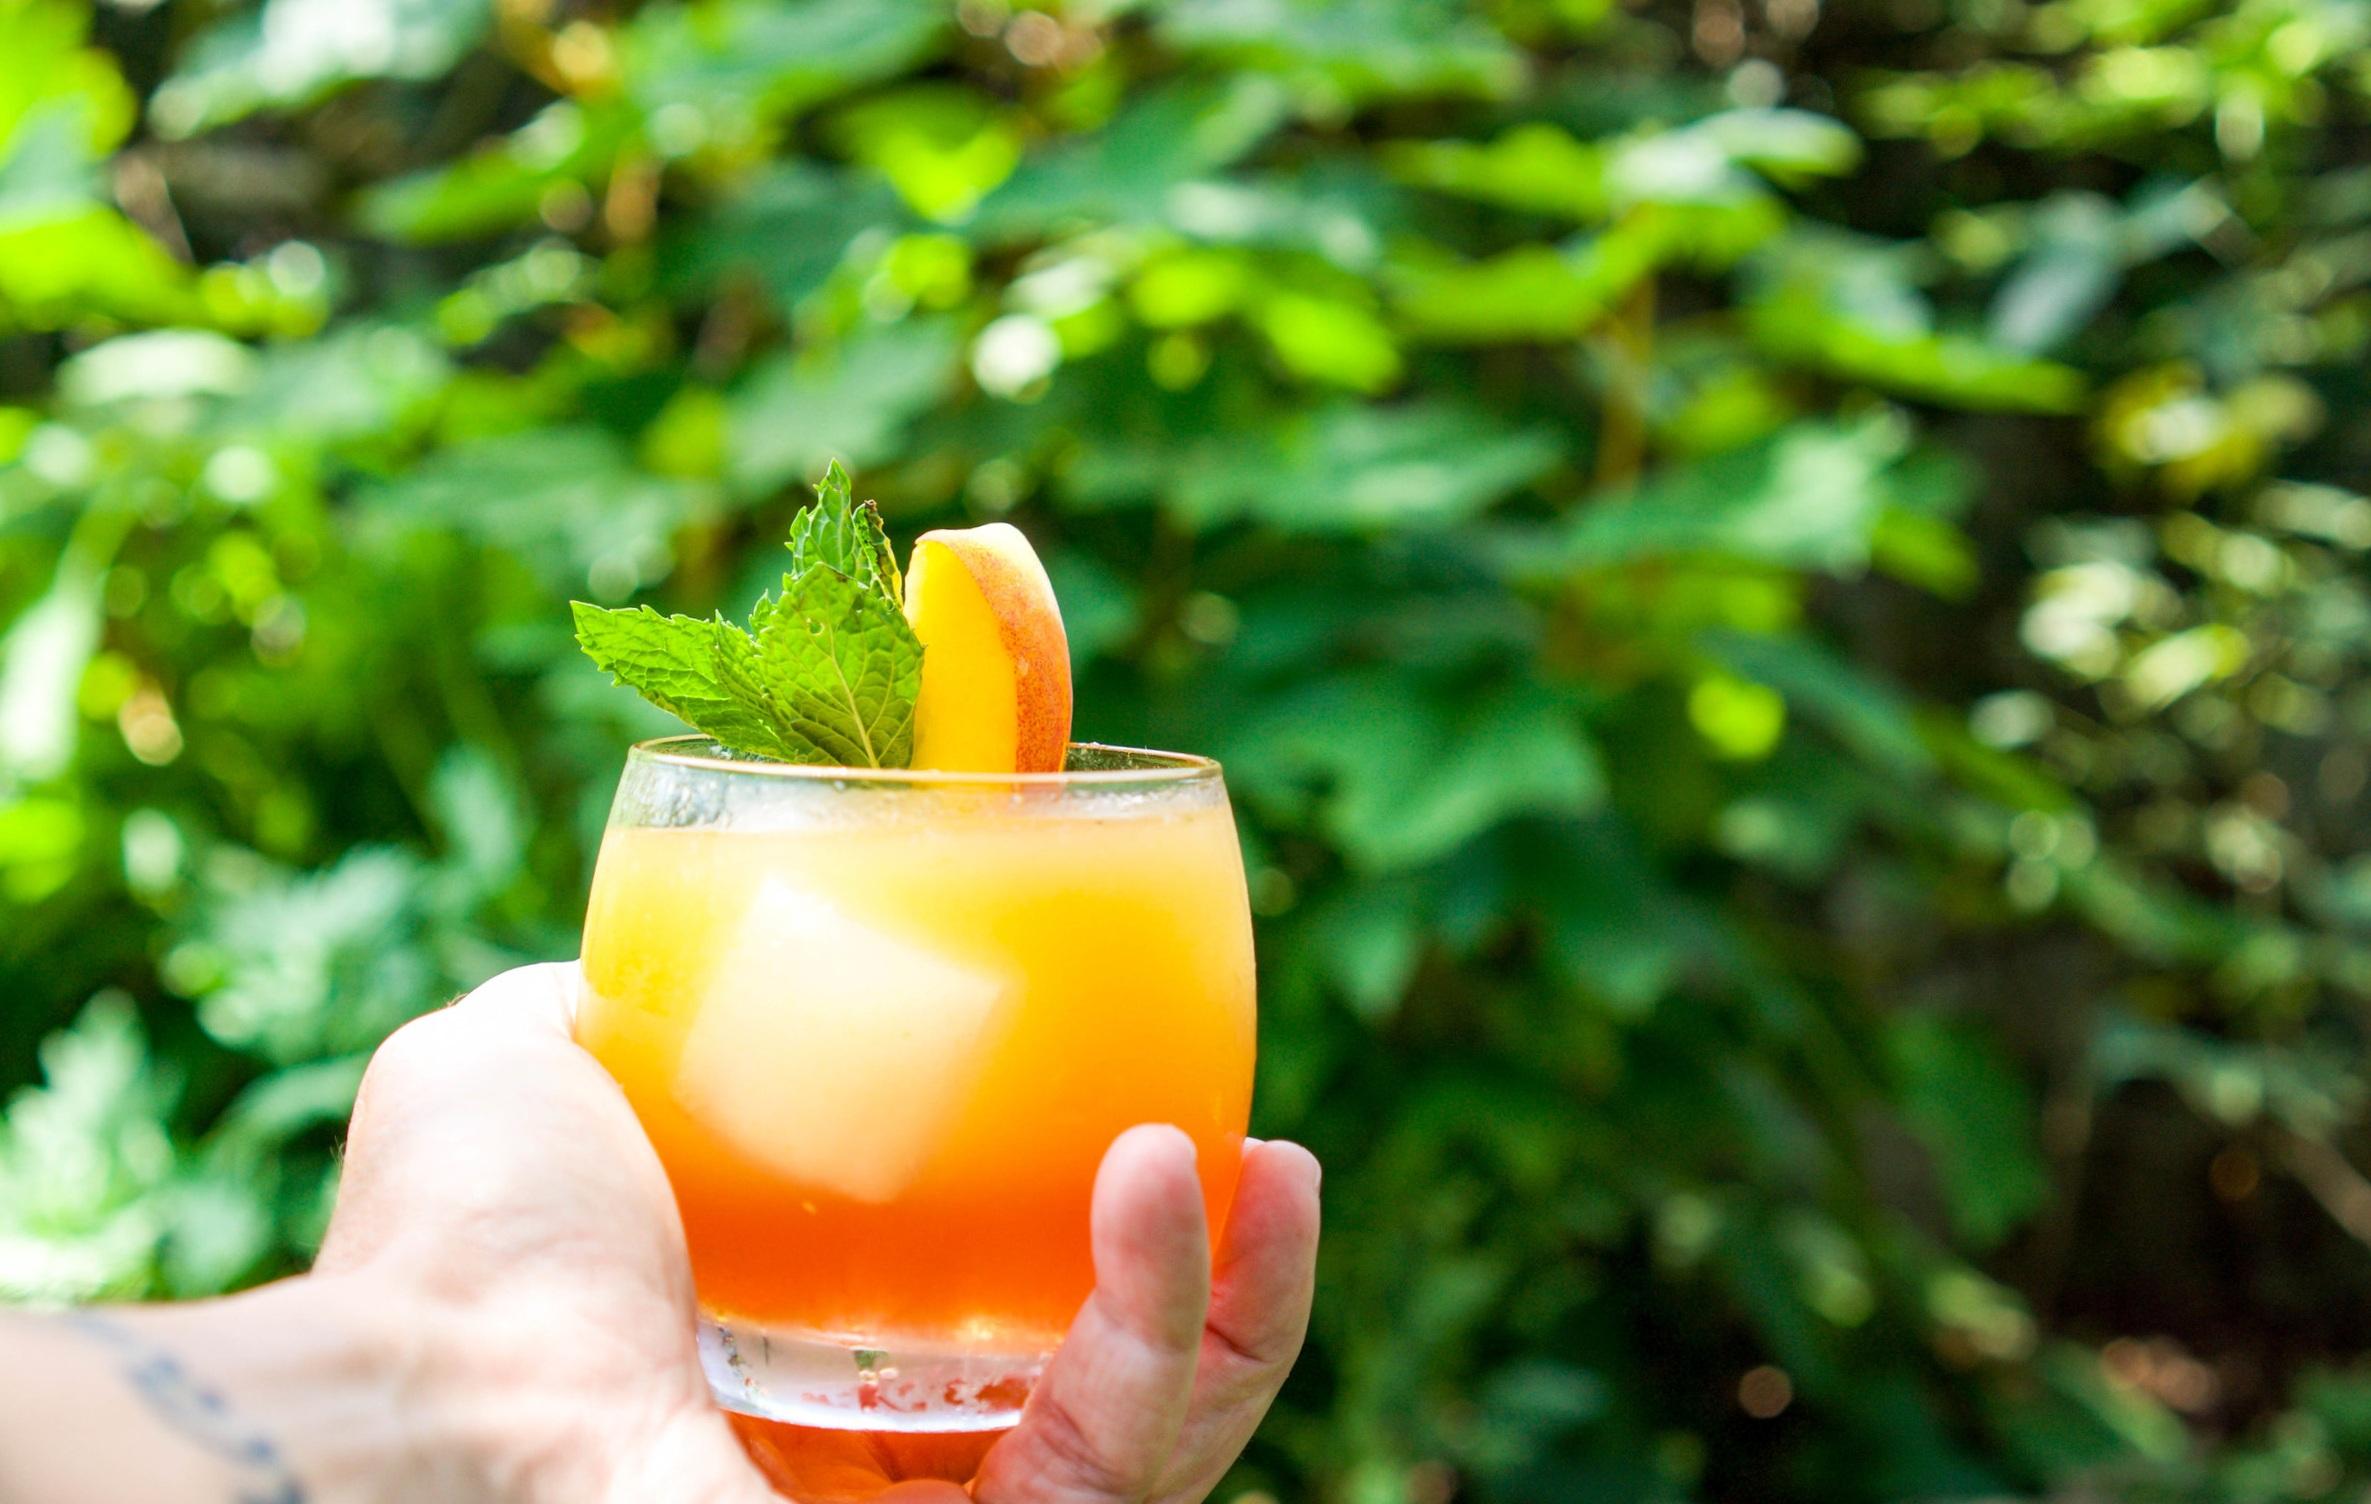 Peach+Bourbon+Smash+cocktail.jpg